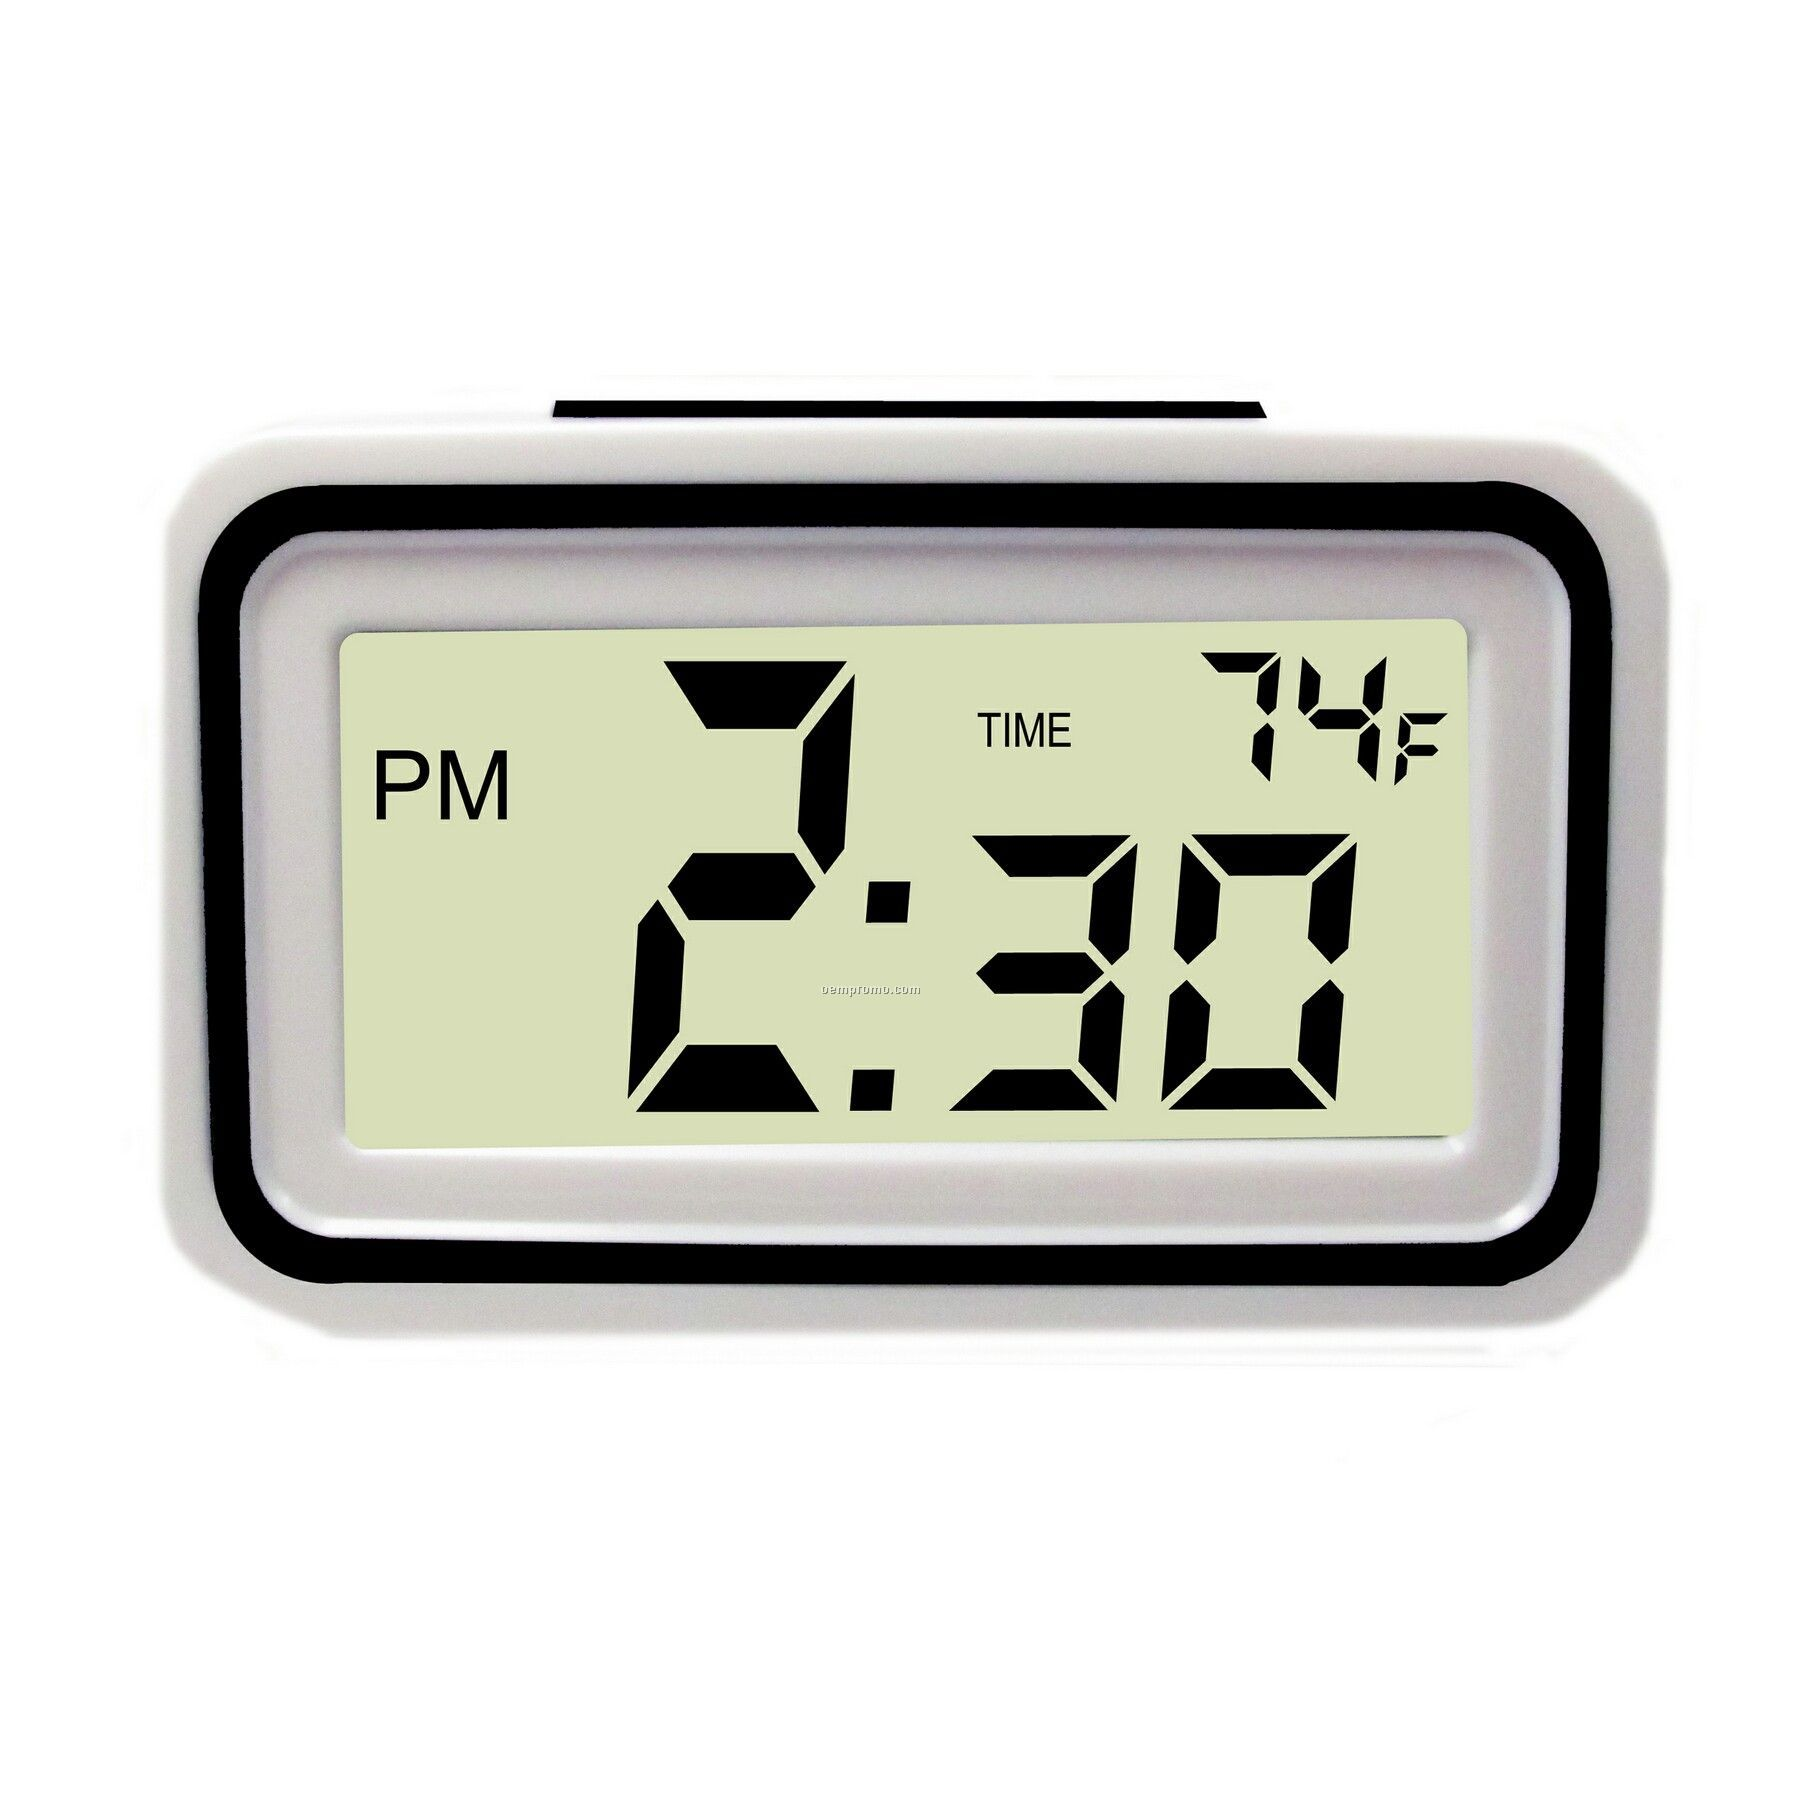 Talking Alarm Clock Talking Alarm Clock With